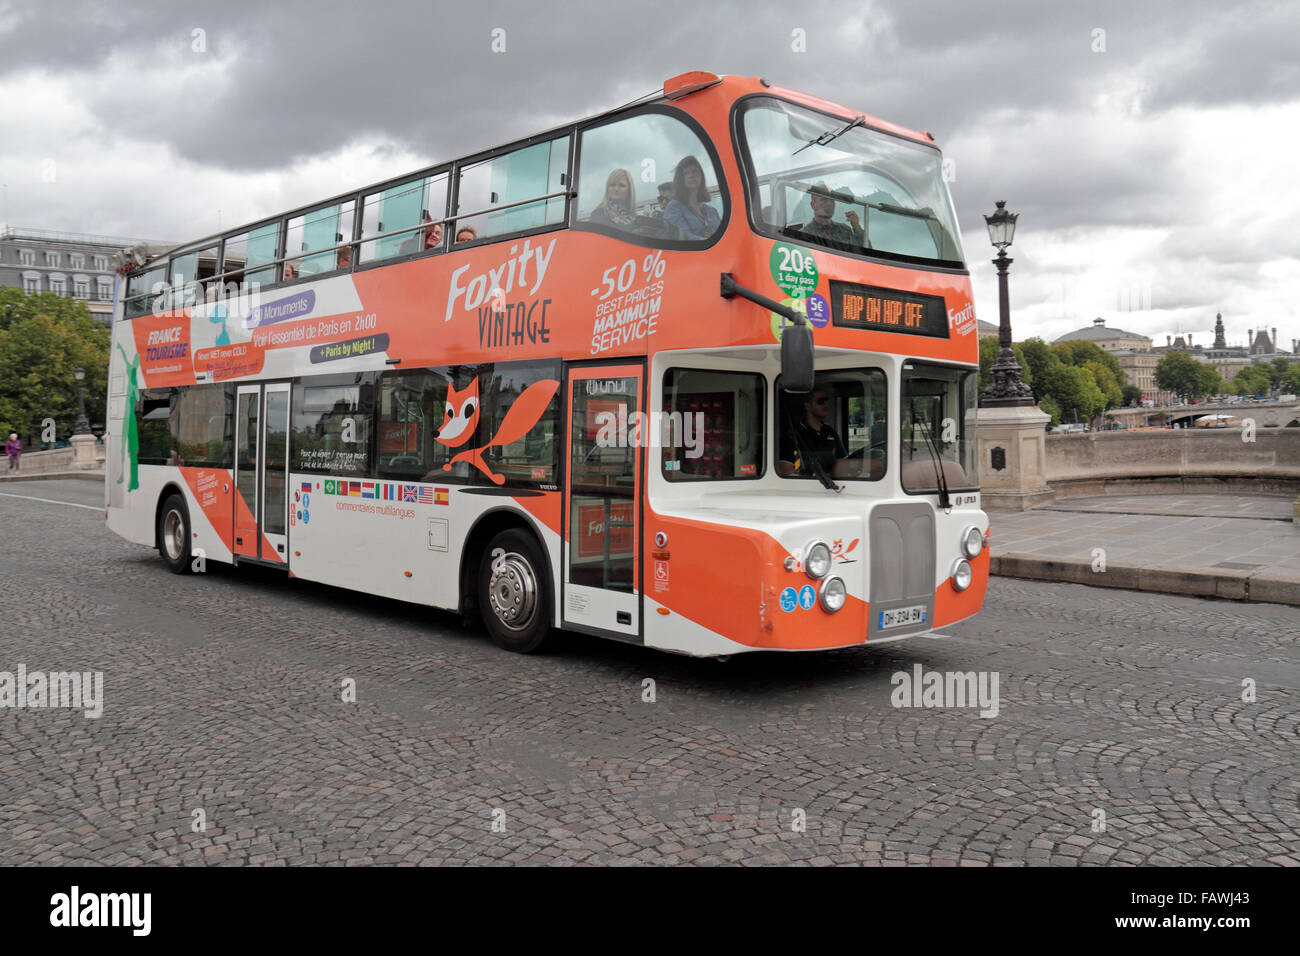 a foxity bus tours hop on hop off tourist bus in paris france stock photo 92761427 alamy. Black Bedroom Furniture Sets. Home Design Ideas